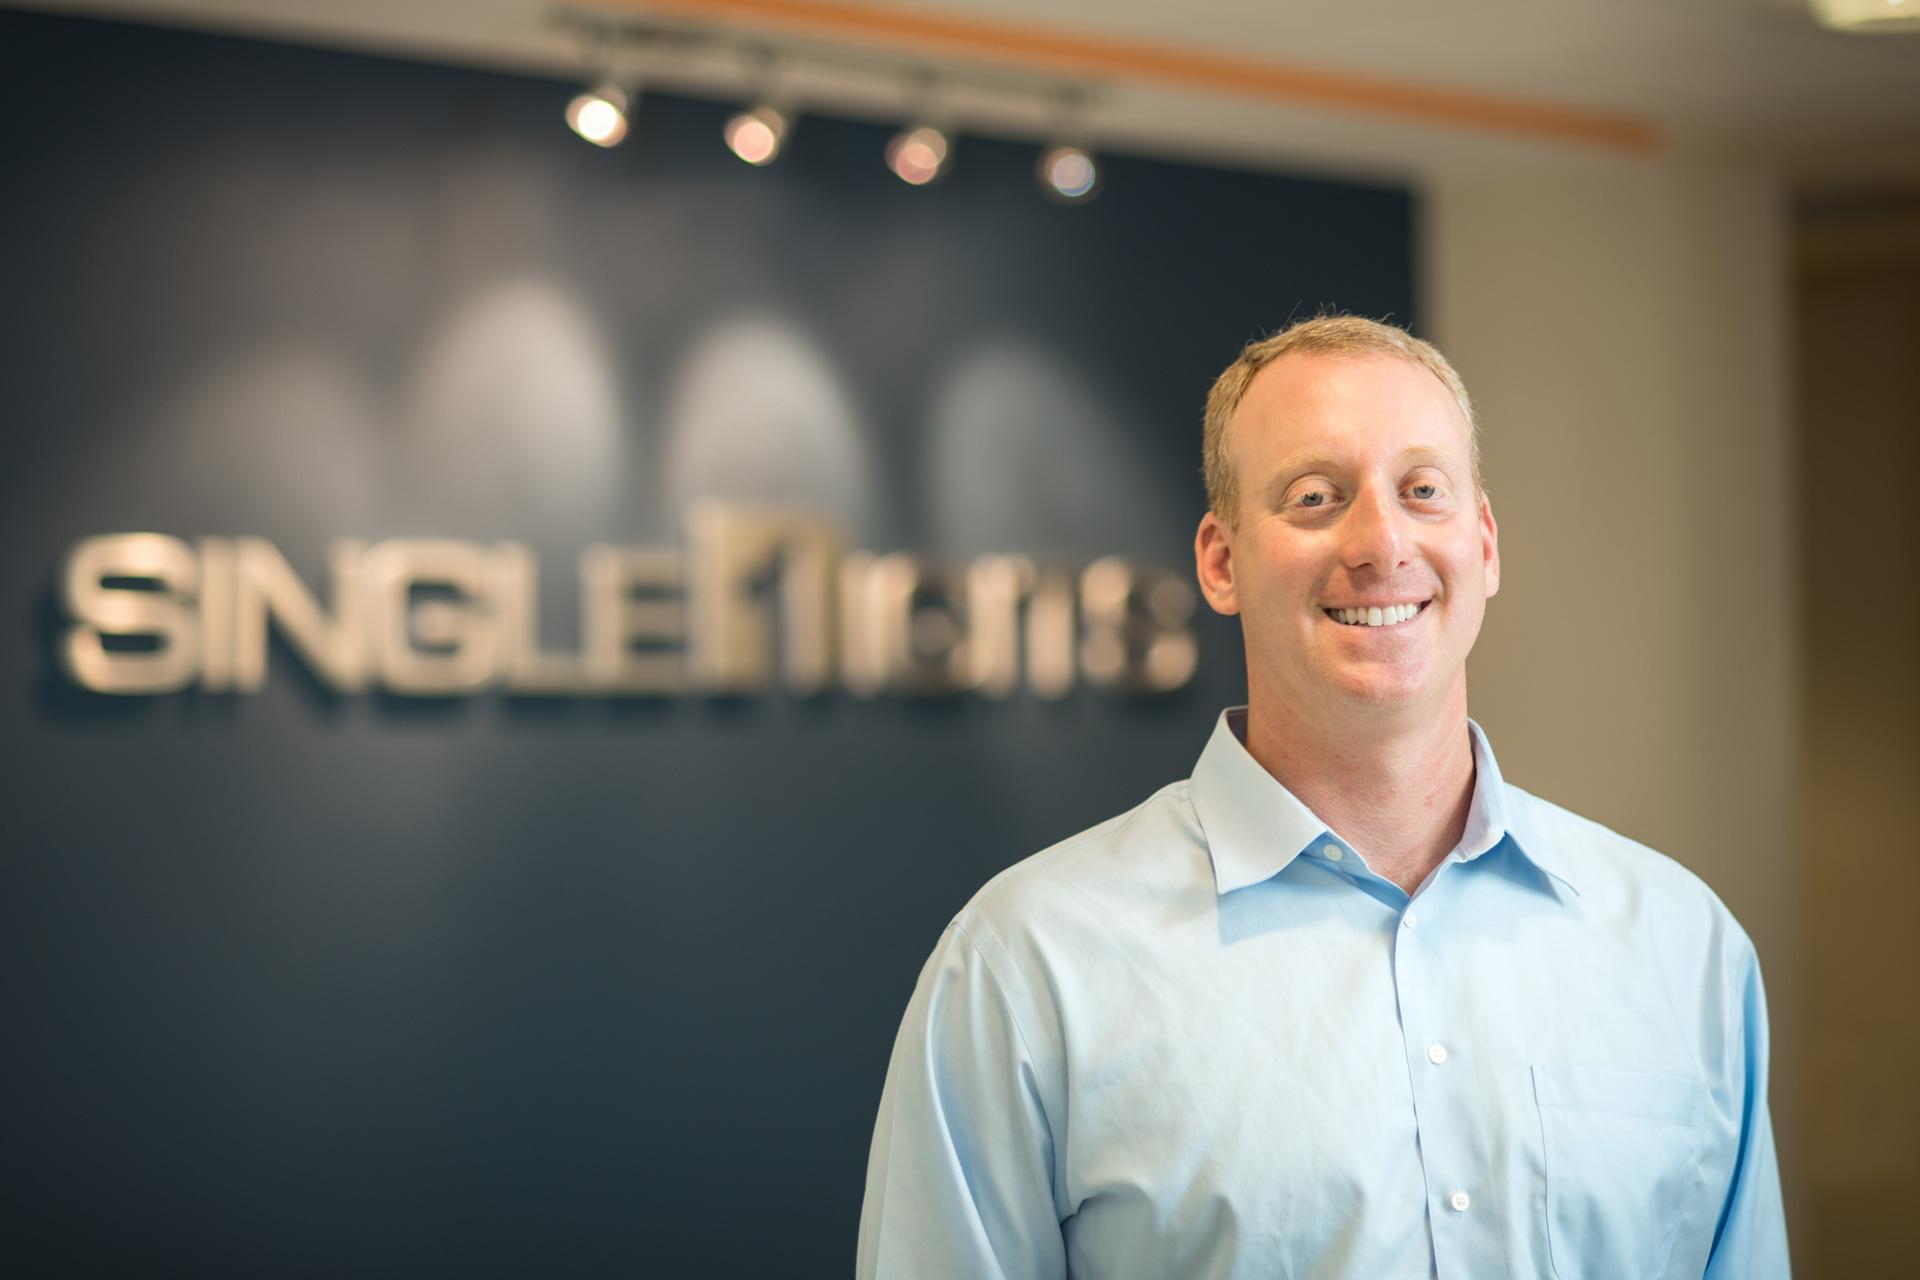 Single Digits co-founder Bob Goldstein